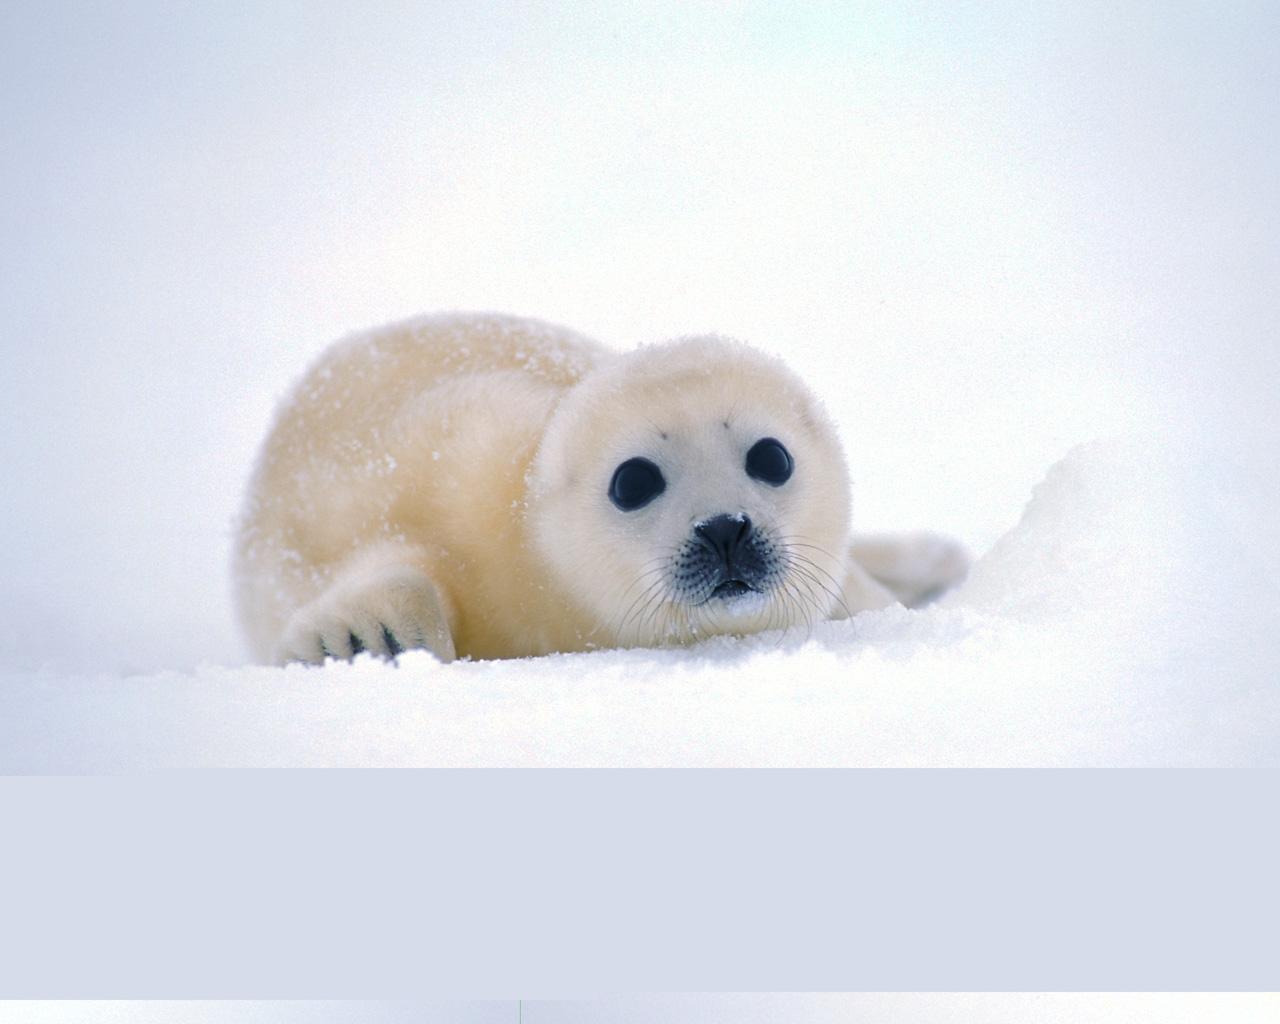 Harp seal pup wallpaper size. Kingdom: Animalia Phylum: Chordata